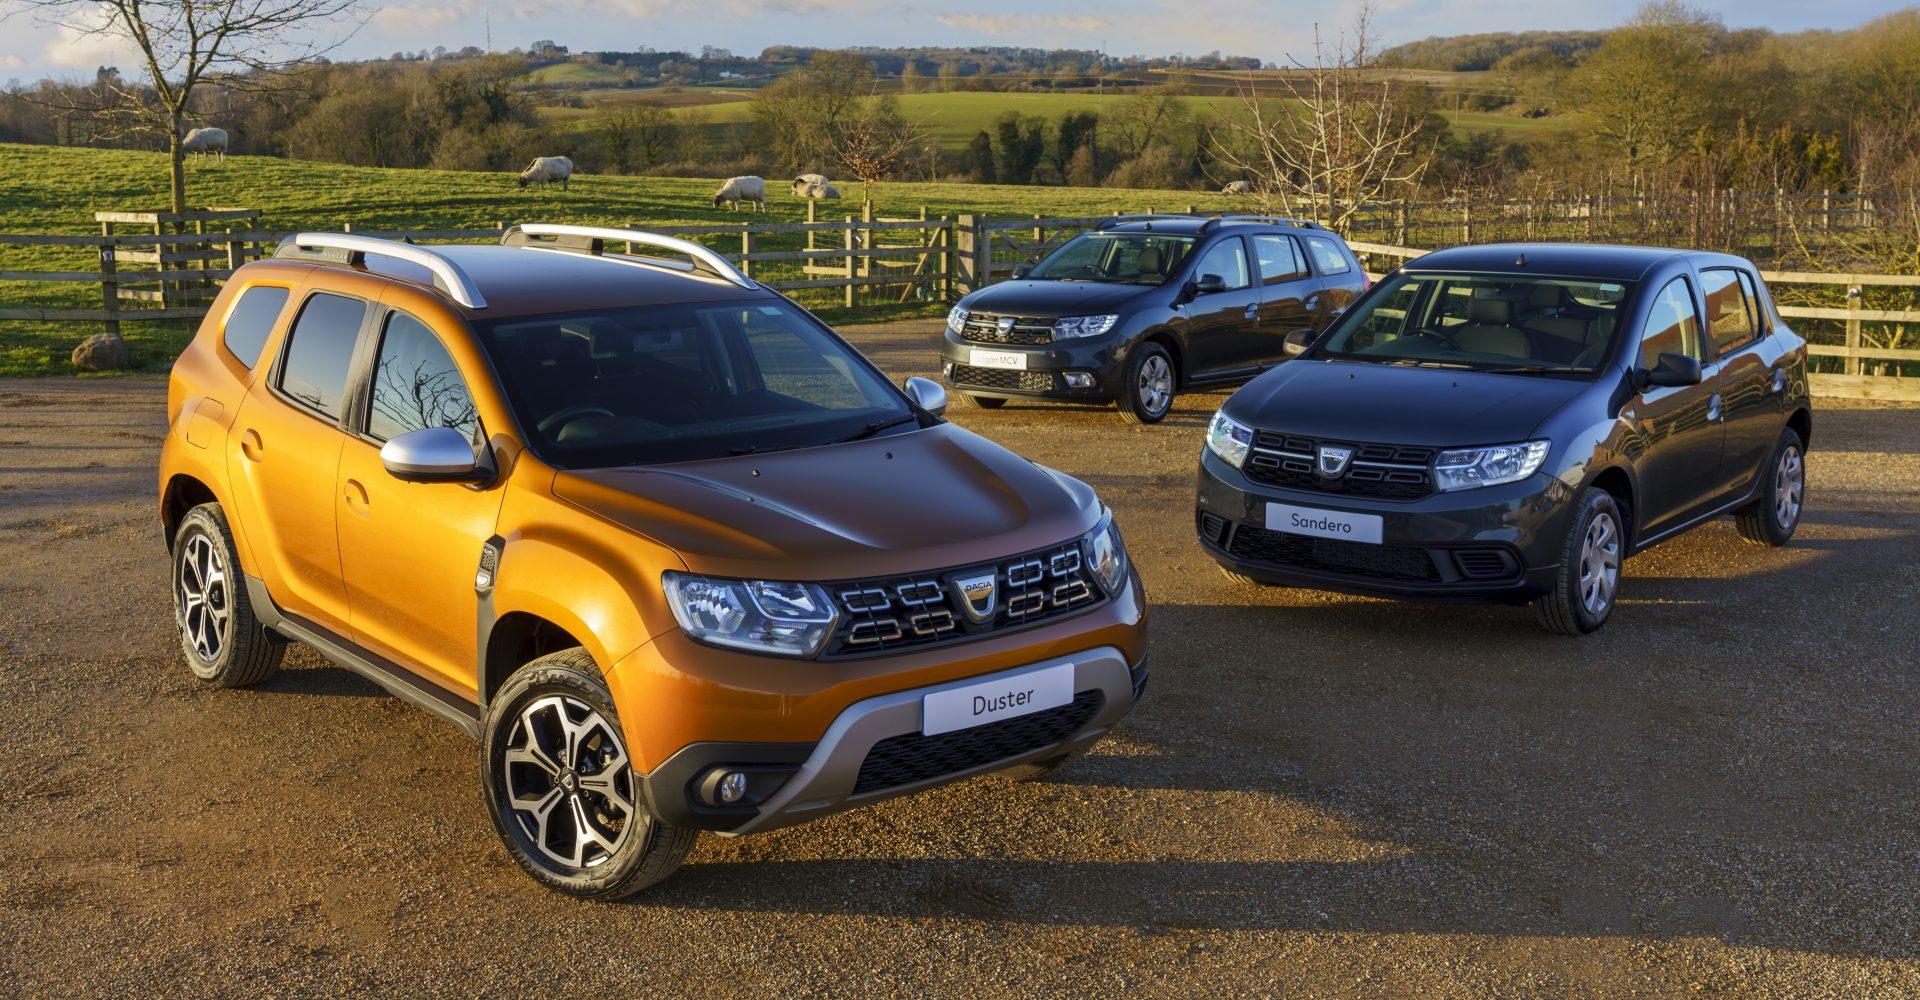 Dacia introduces LPG bi-fuel cars to the UK market